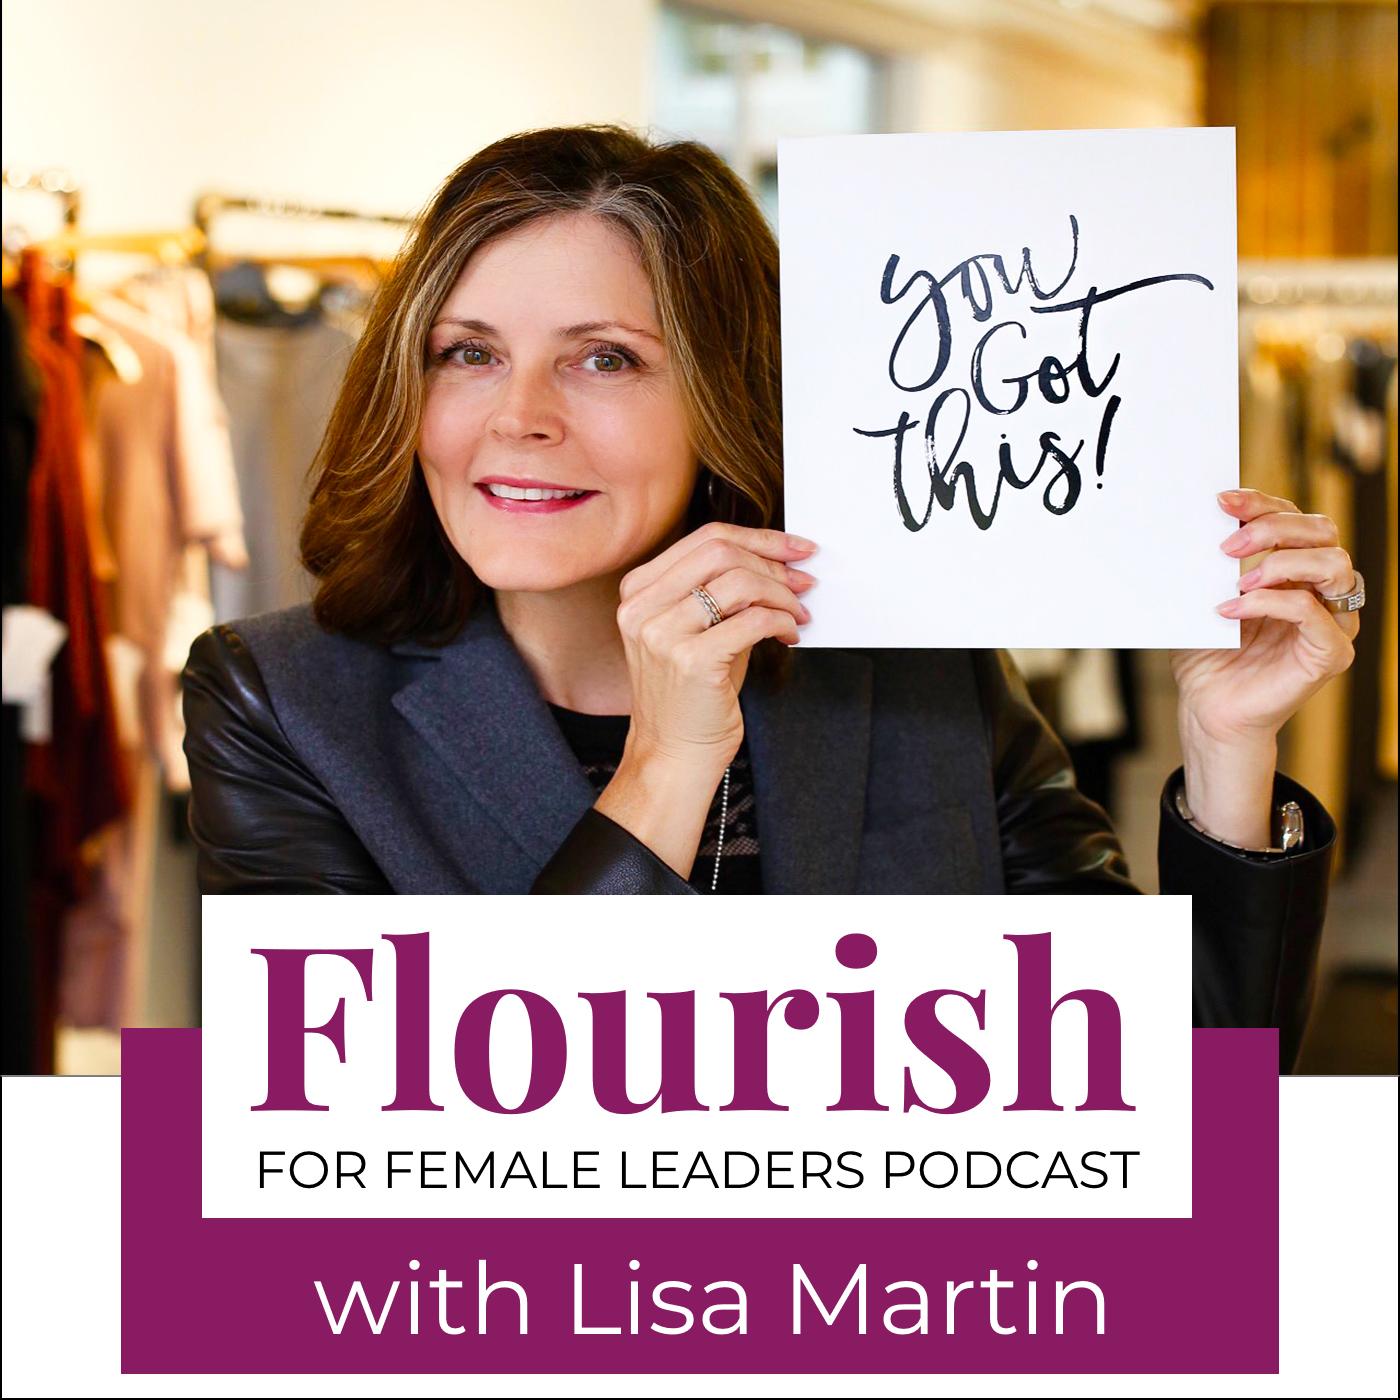 FLOURISH for Female Leaders podcast show art